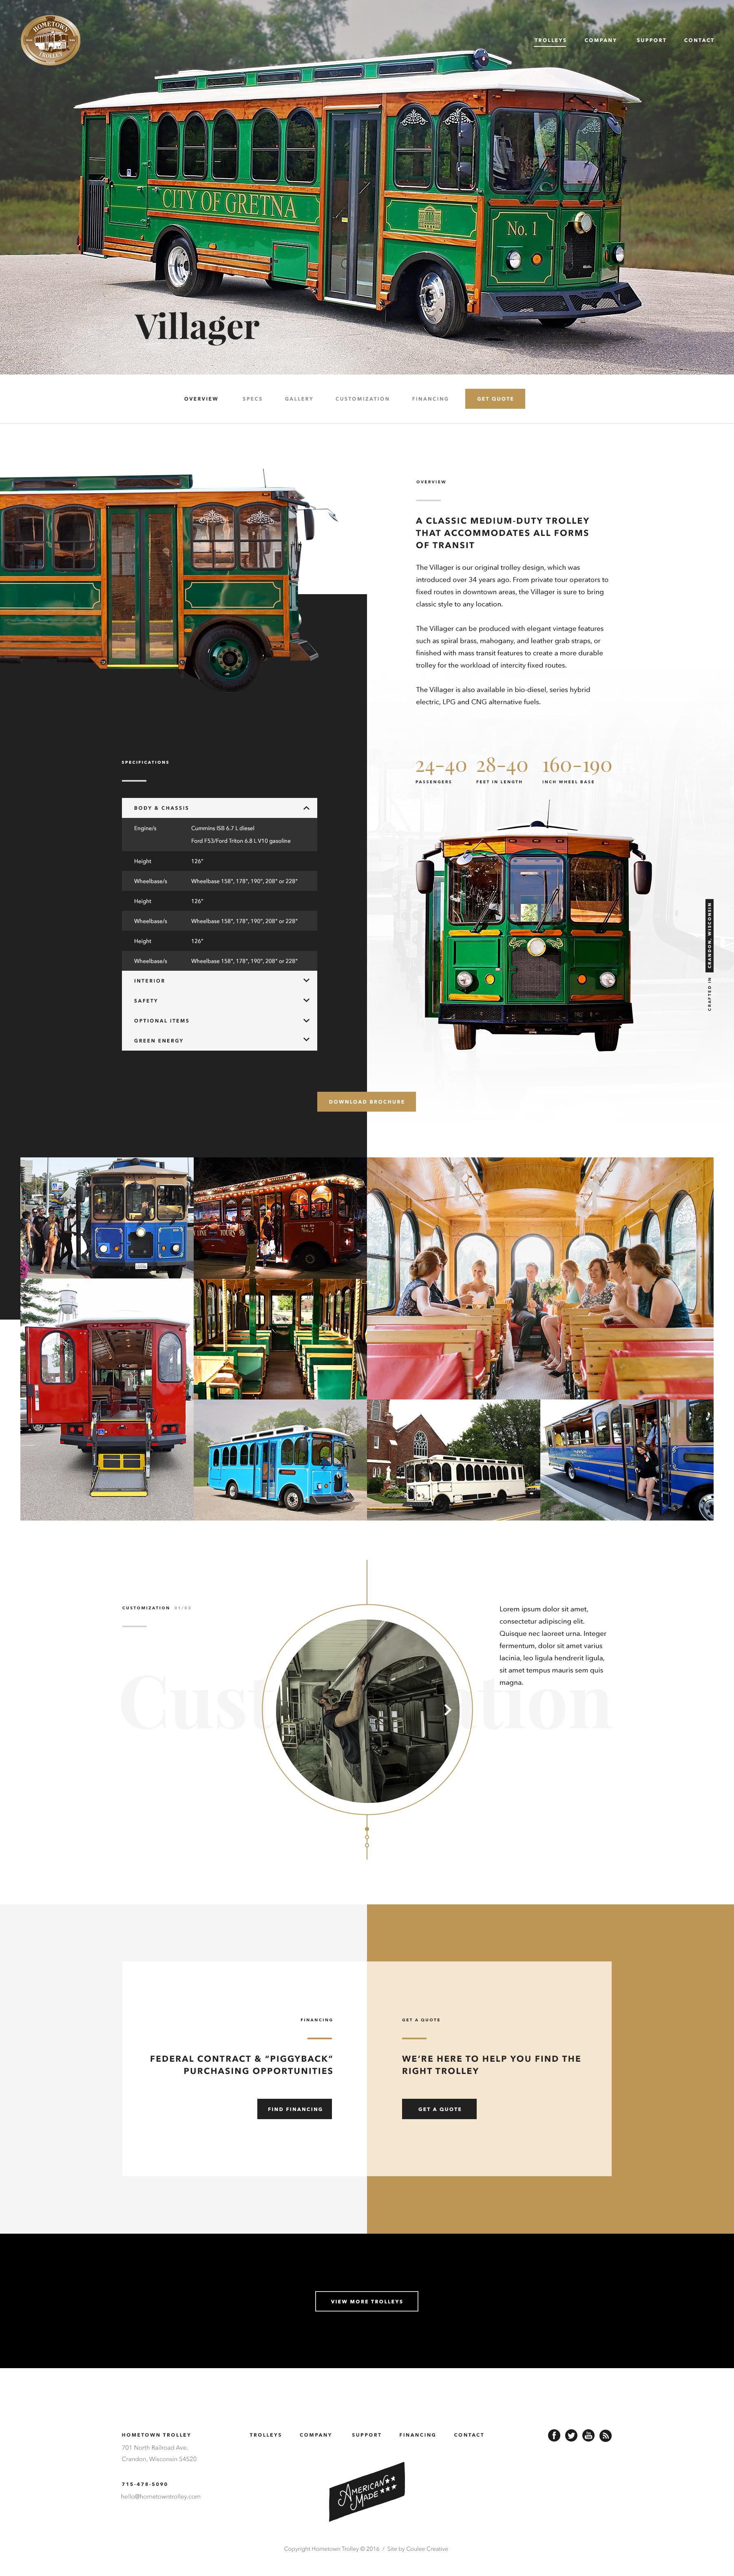 Villager trolley